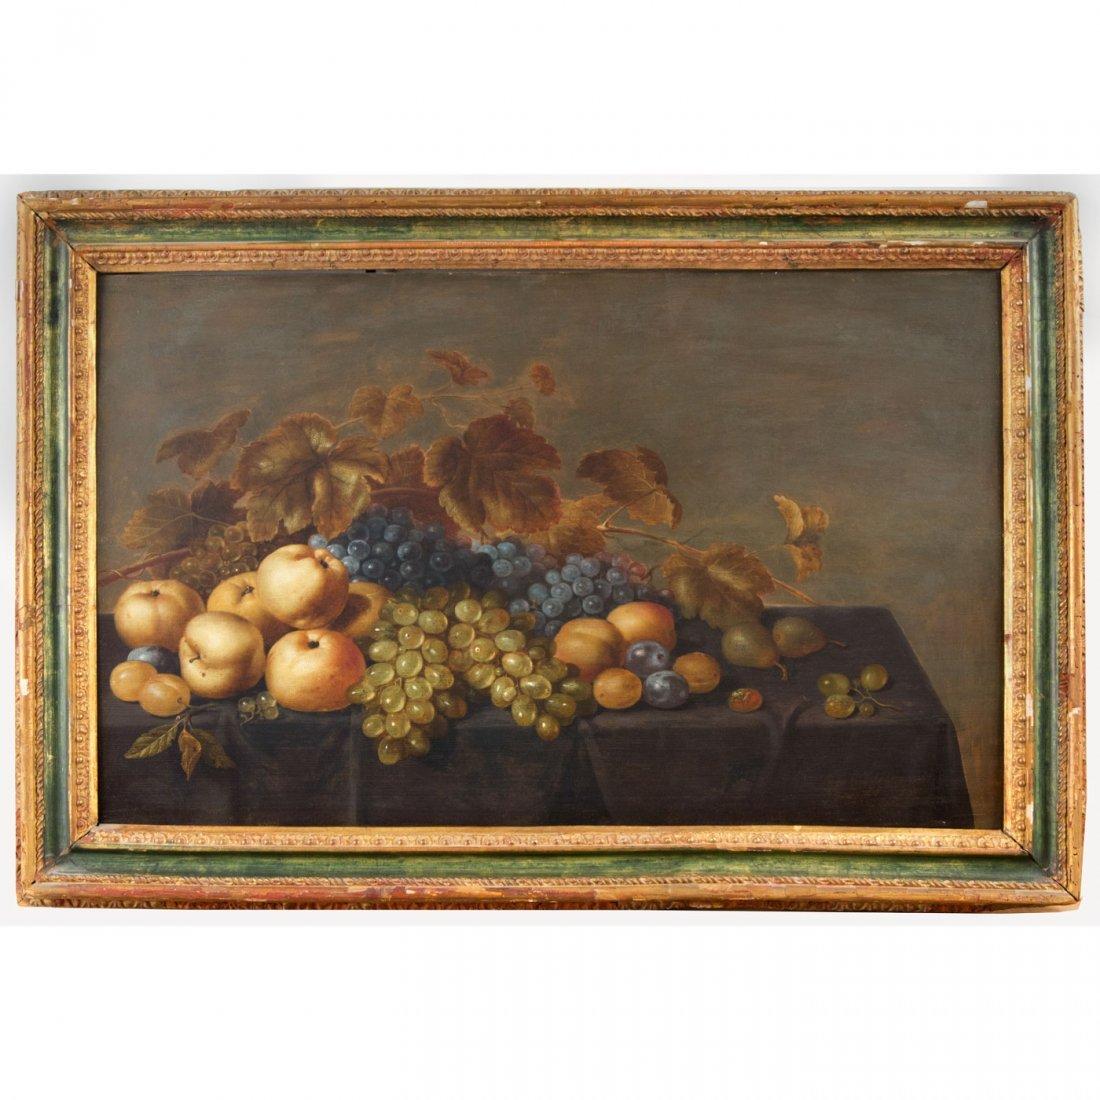 4: Attributed to Roelof Koets, (1592-1653)